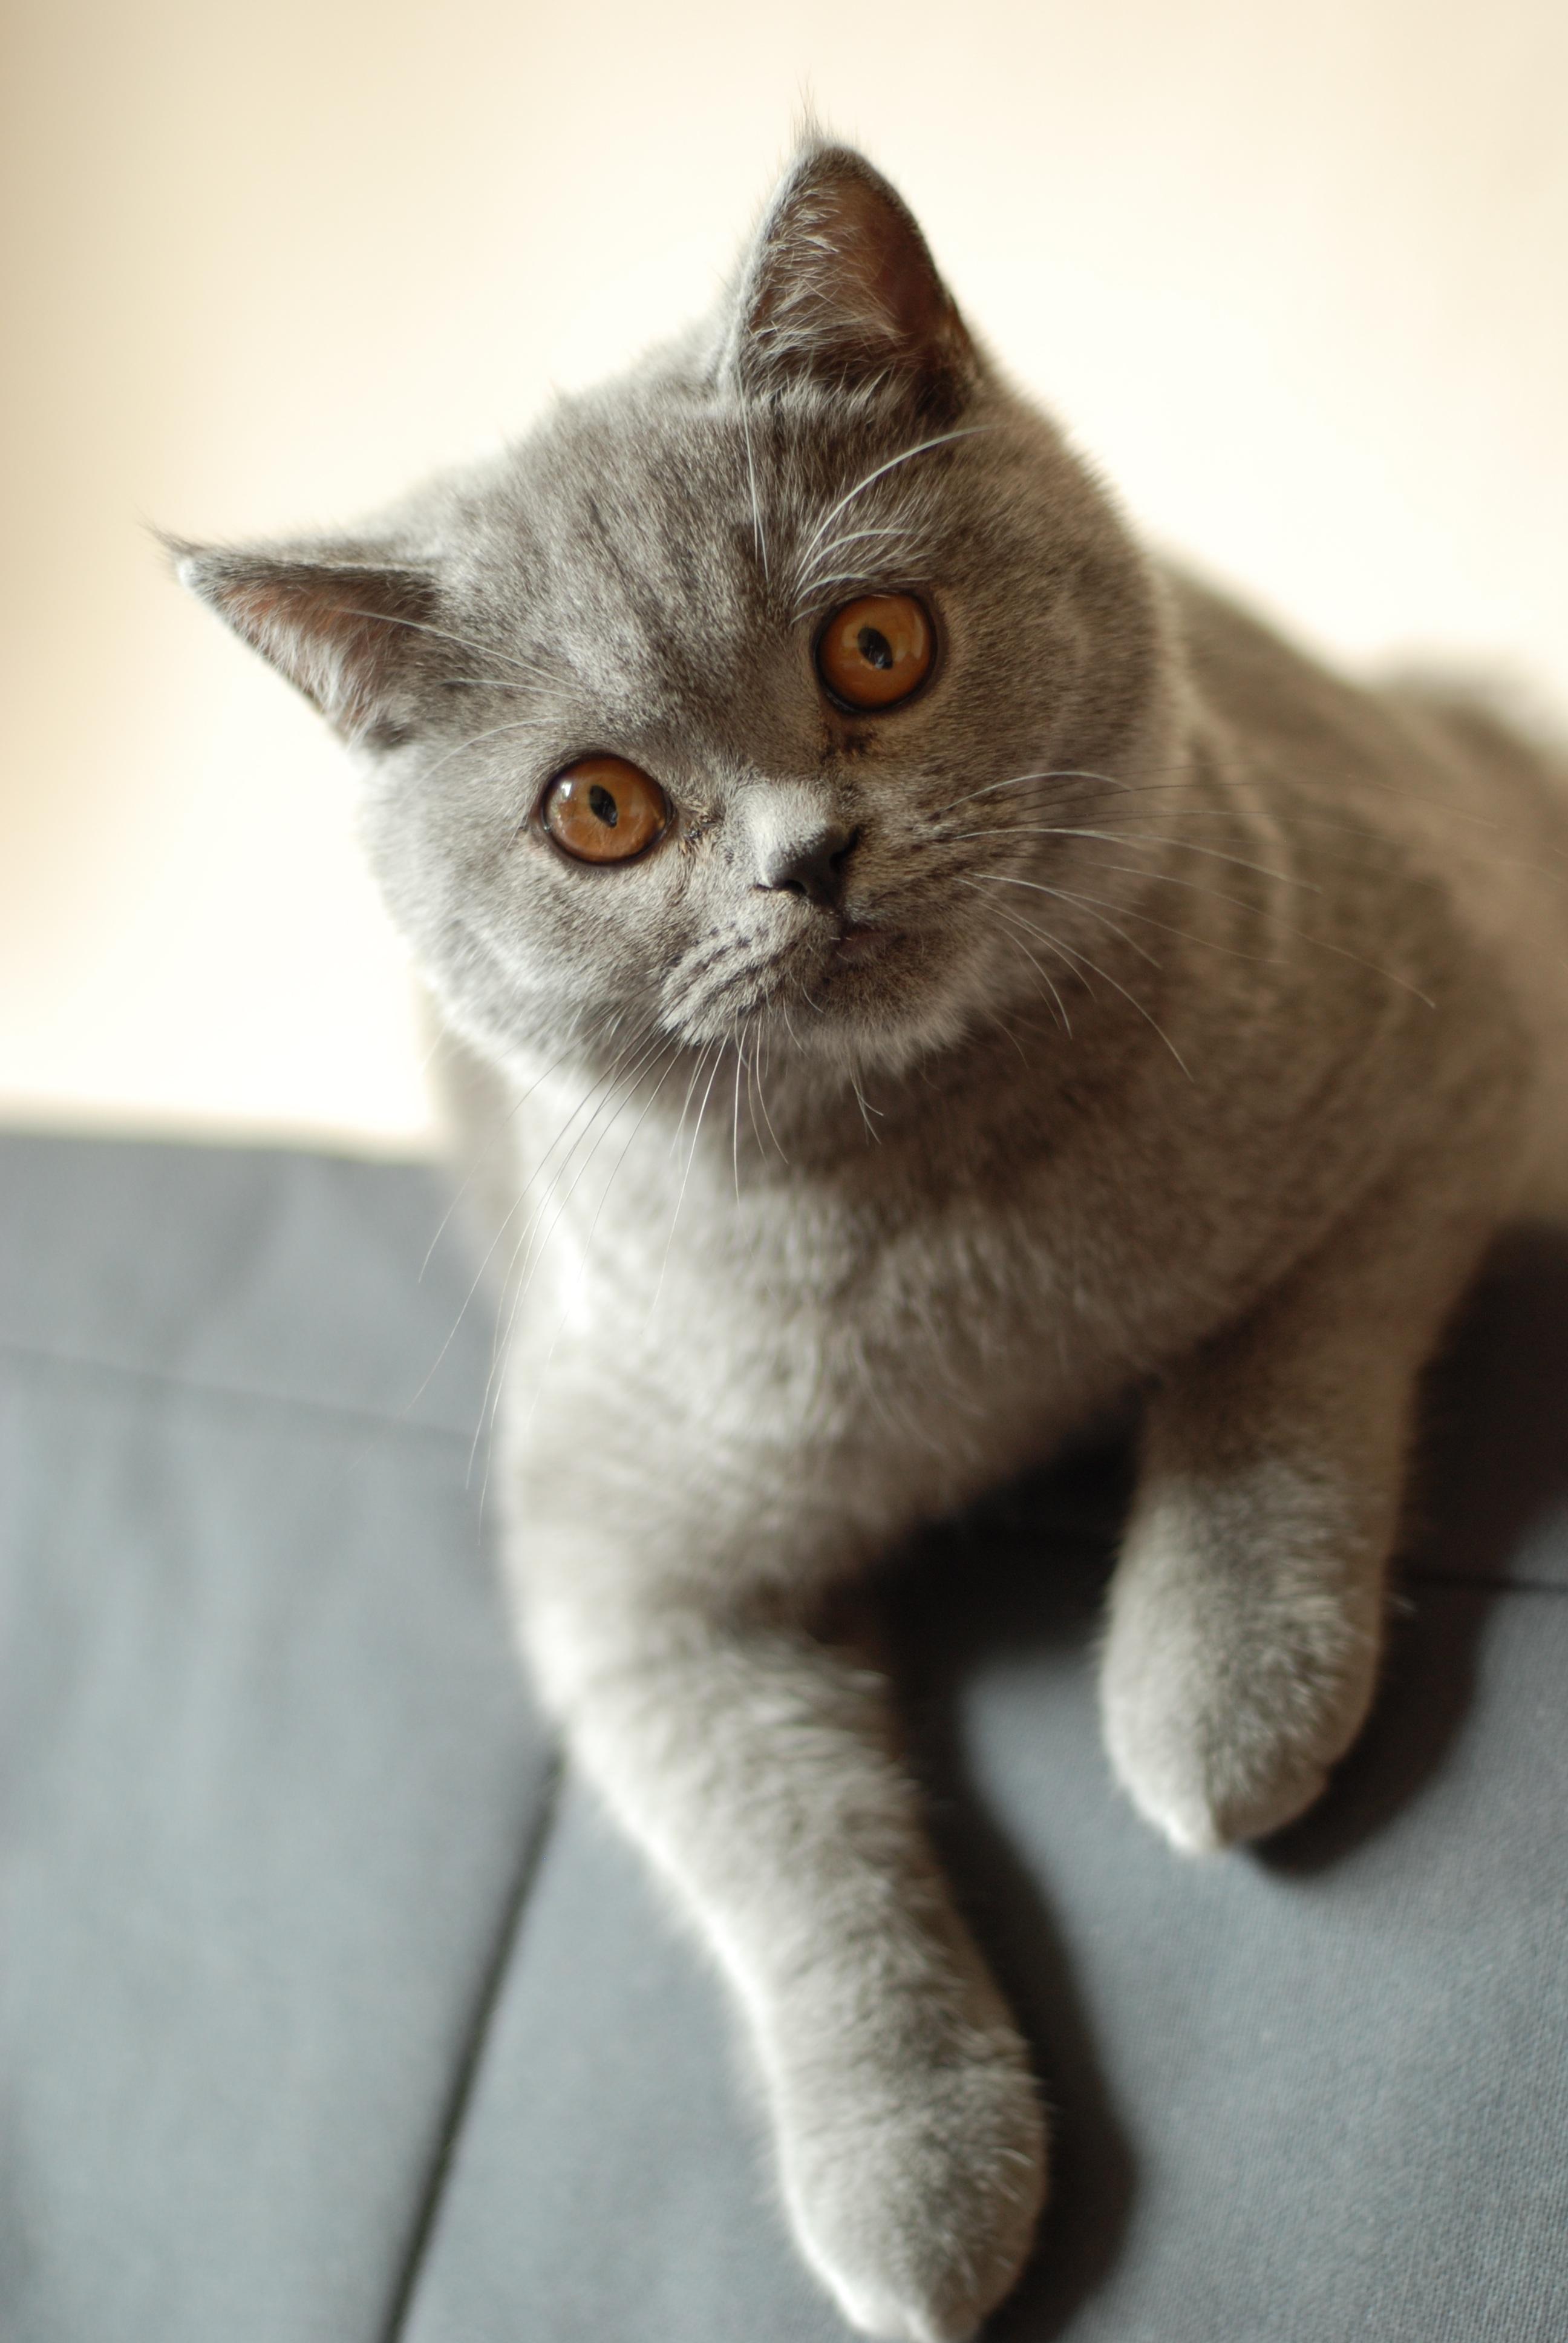 Free Images : sweet, animal, pet, coat, feline, whiskers ...